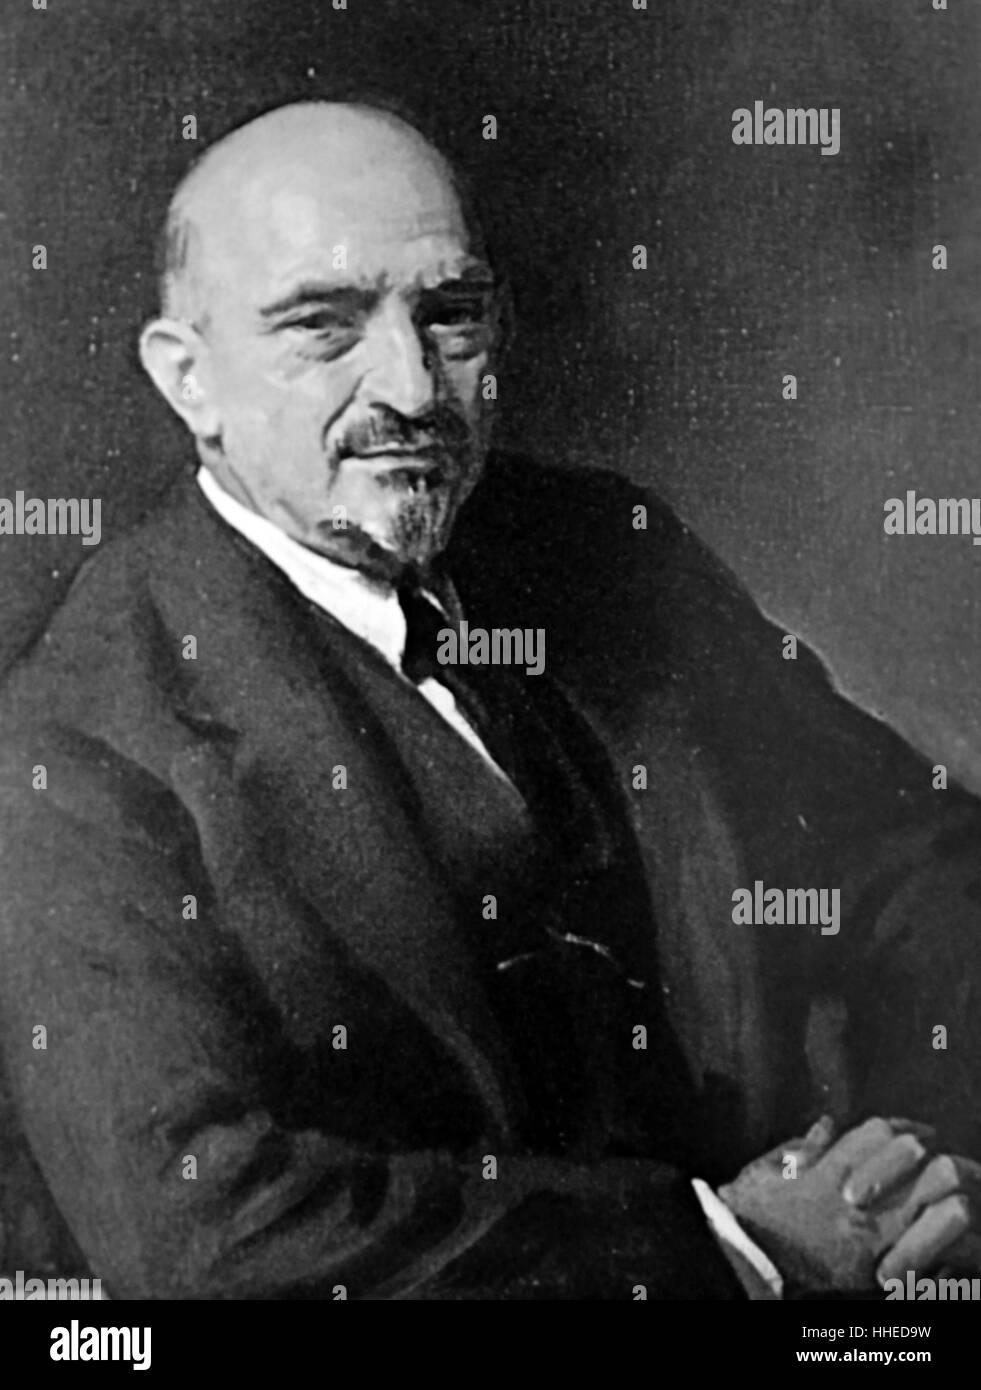 Chaim Azriel Weizmann (1874 – 1952) Zionist leader and Israeli statesman - Stock Image